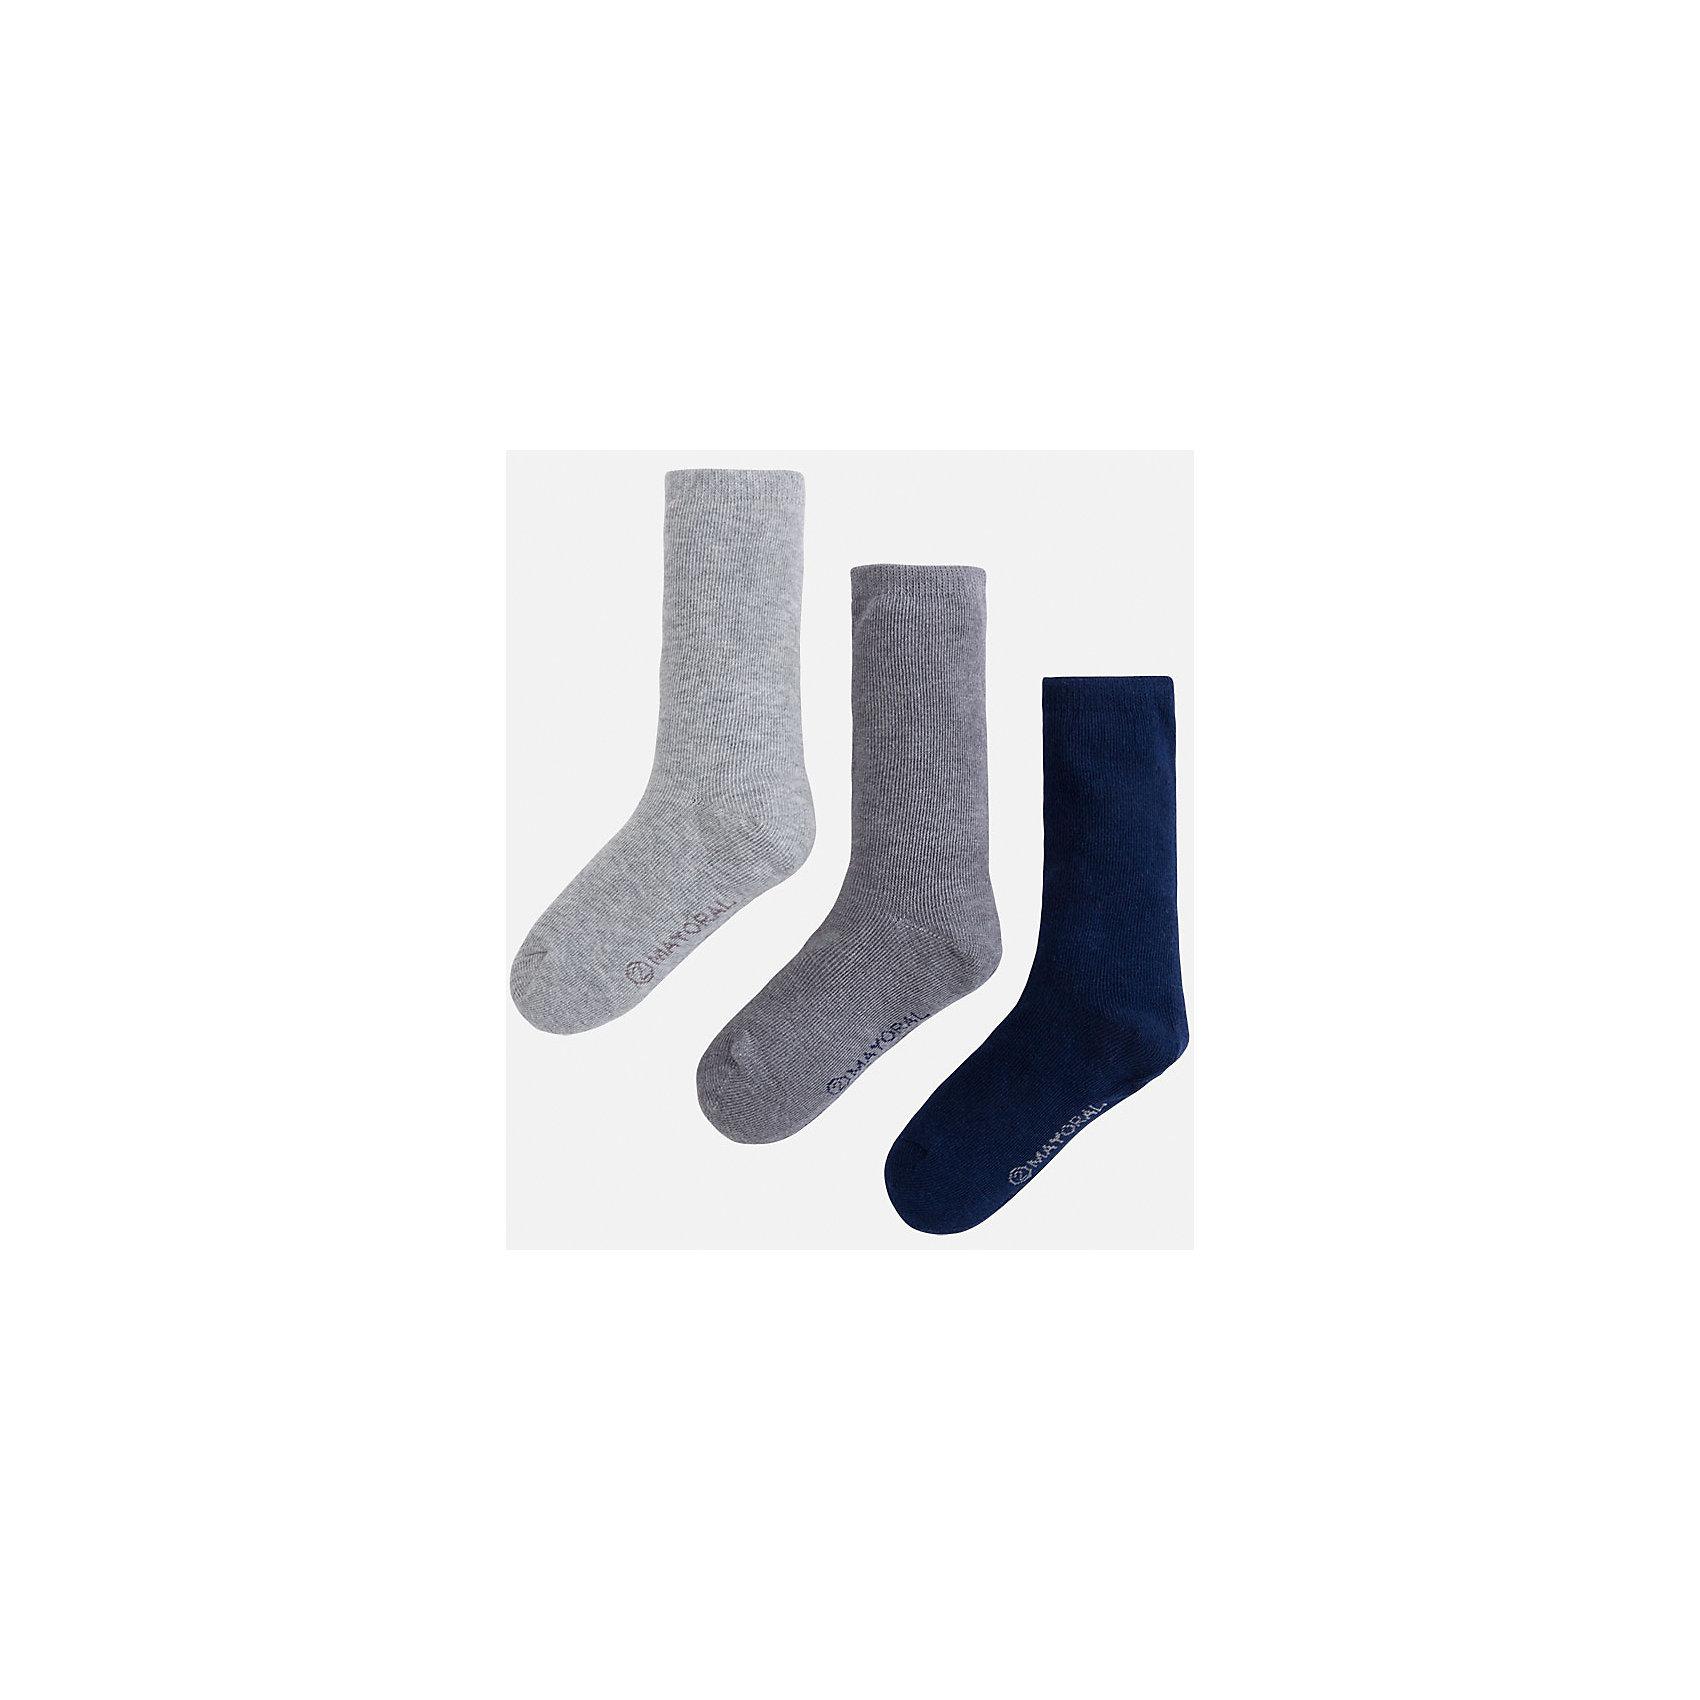 Mayoral Носки для мальчика, 3 пары mayoral mayoral носки 3 шт белый серый синий